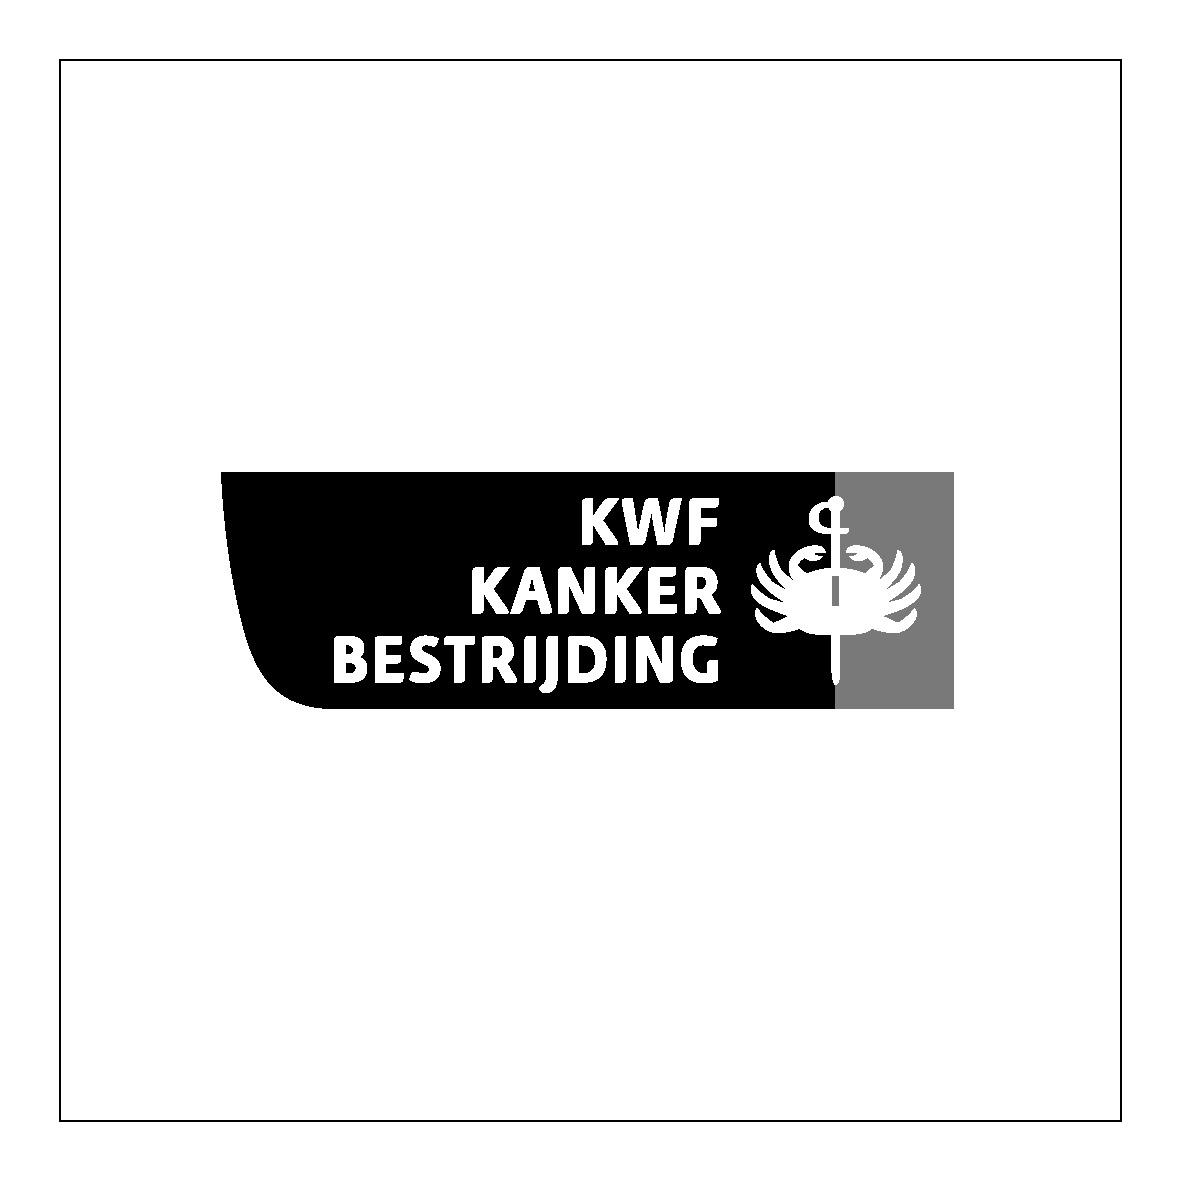 Logos_Klanten11.jpg